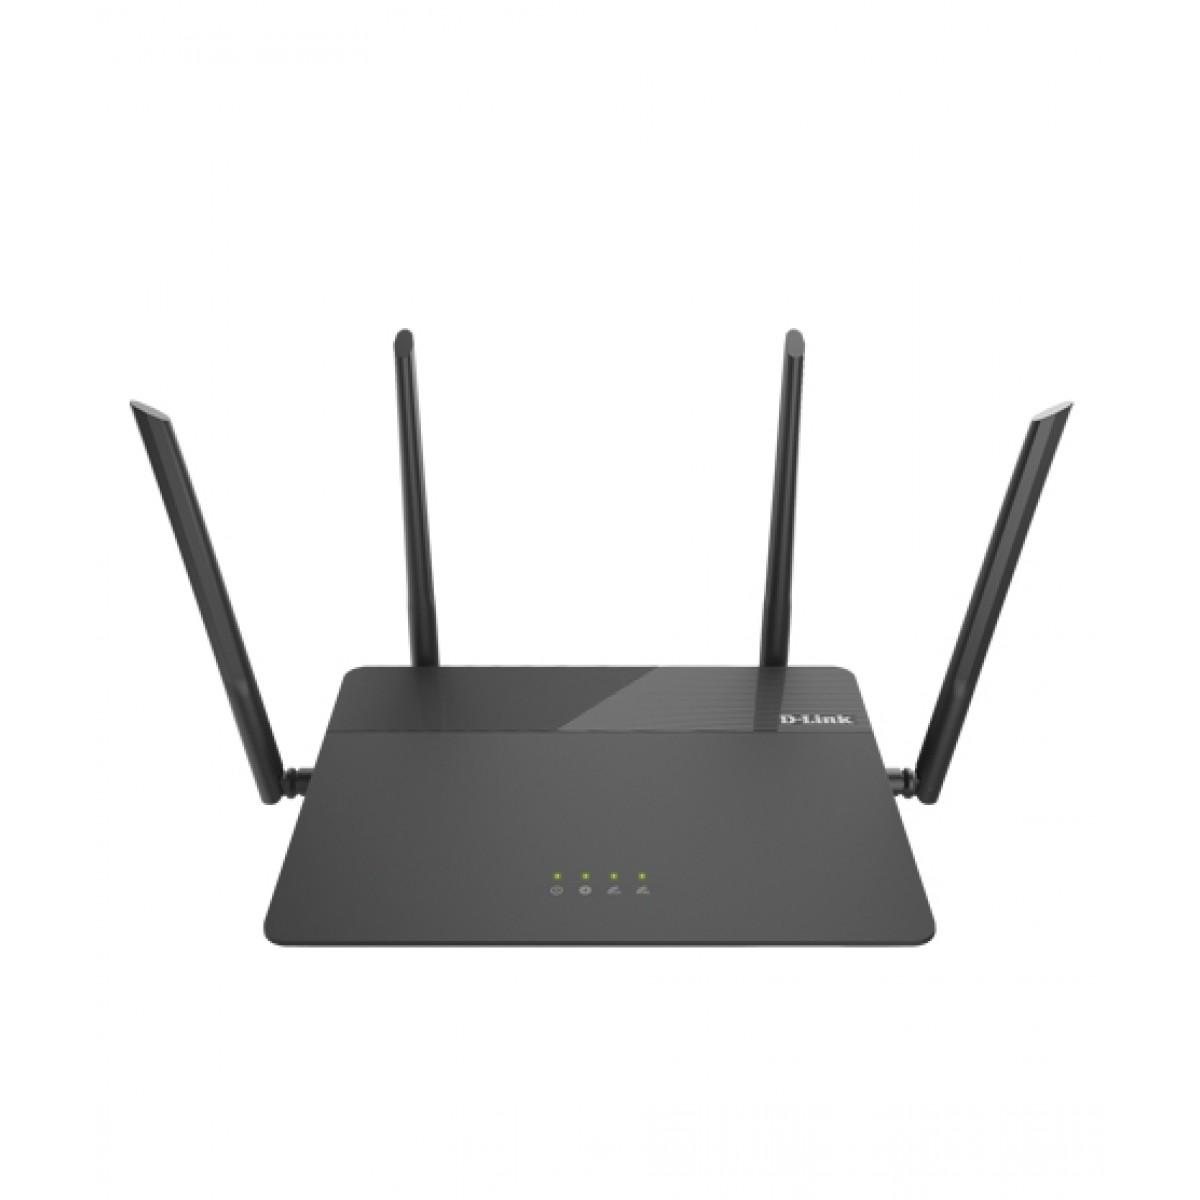 D-Link AC2600 MU-MIMO Dual-Band Ultra Gigabit Wi-Fi Router (DIR-882)